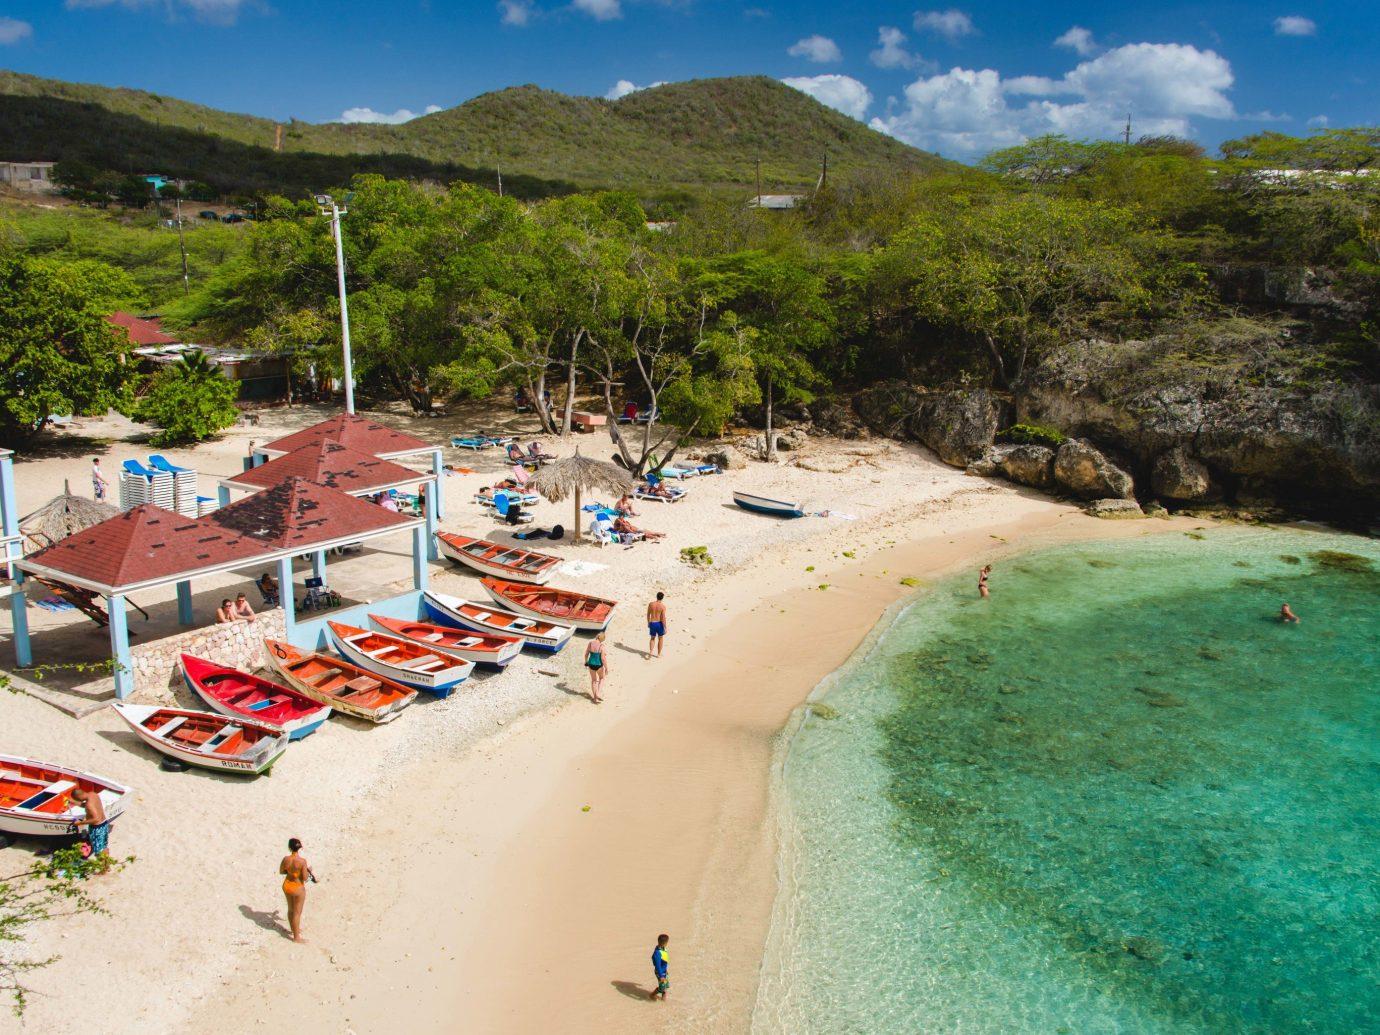 Beaches Beach body of water Coast coastal and oceanic landforms Sea Resort tourism shore bay sky caribbean leisure water vacation cove tropics terrain tree inlet sand landscape Lagoon